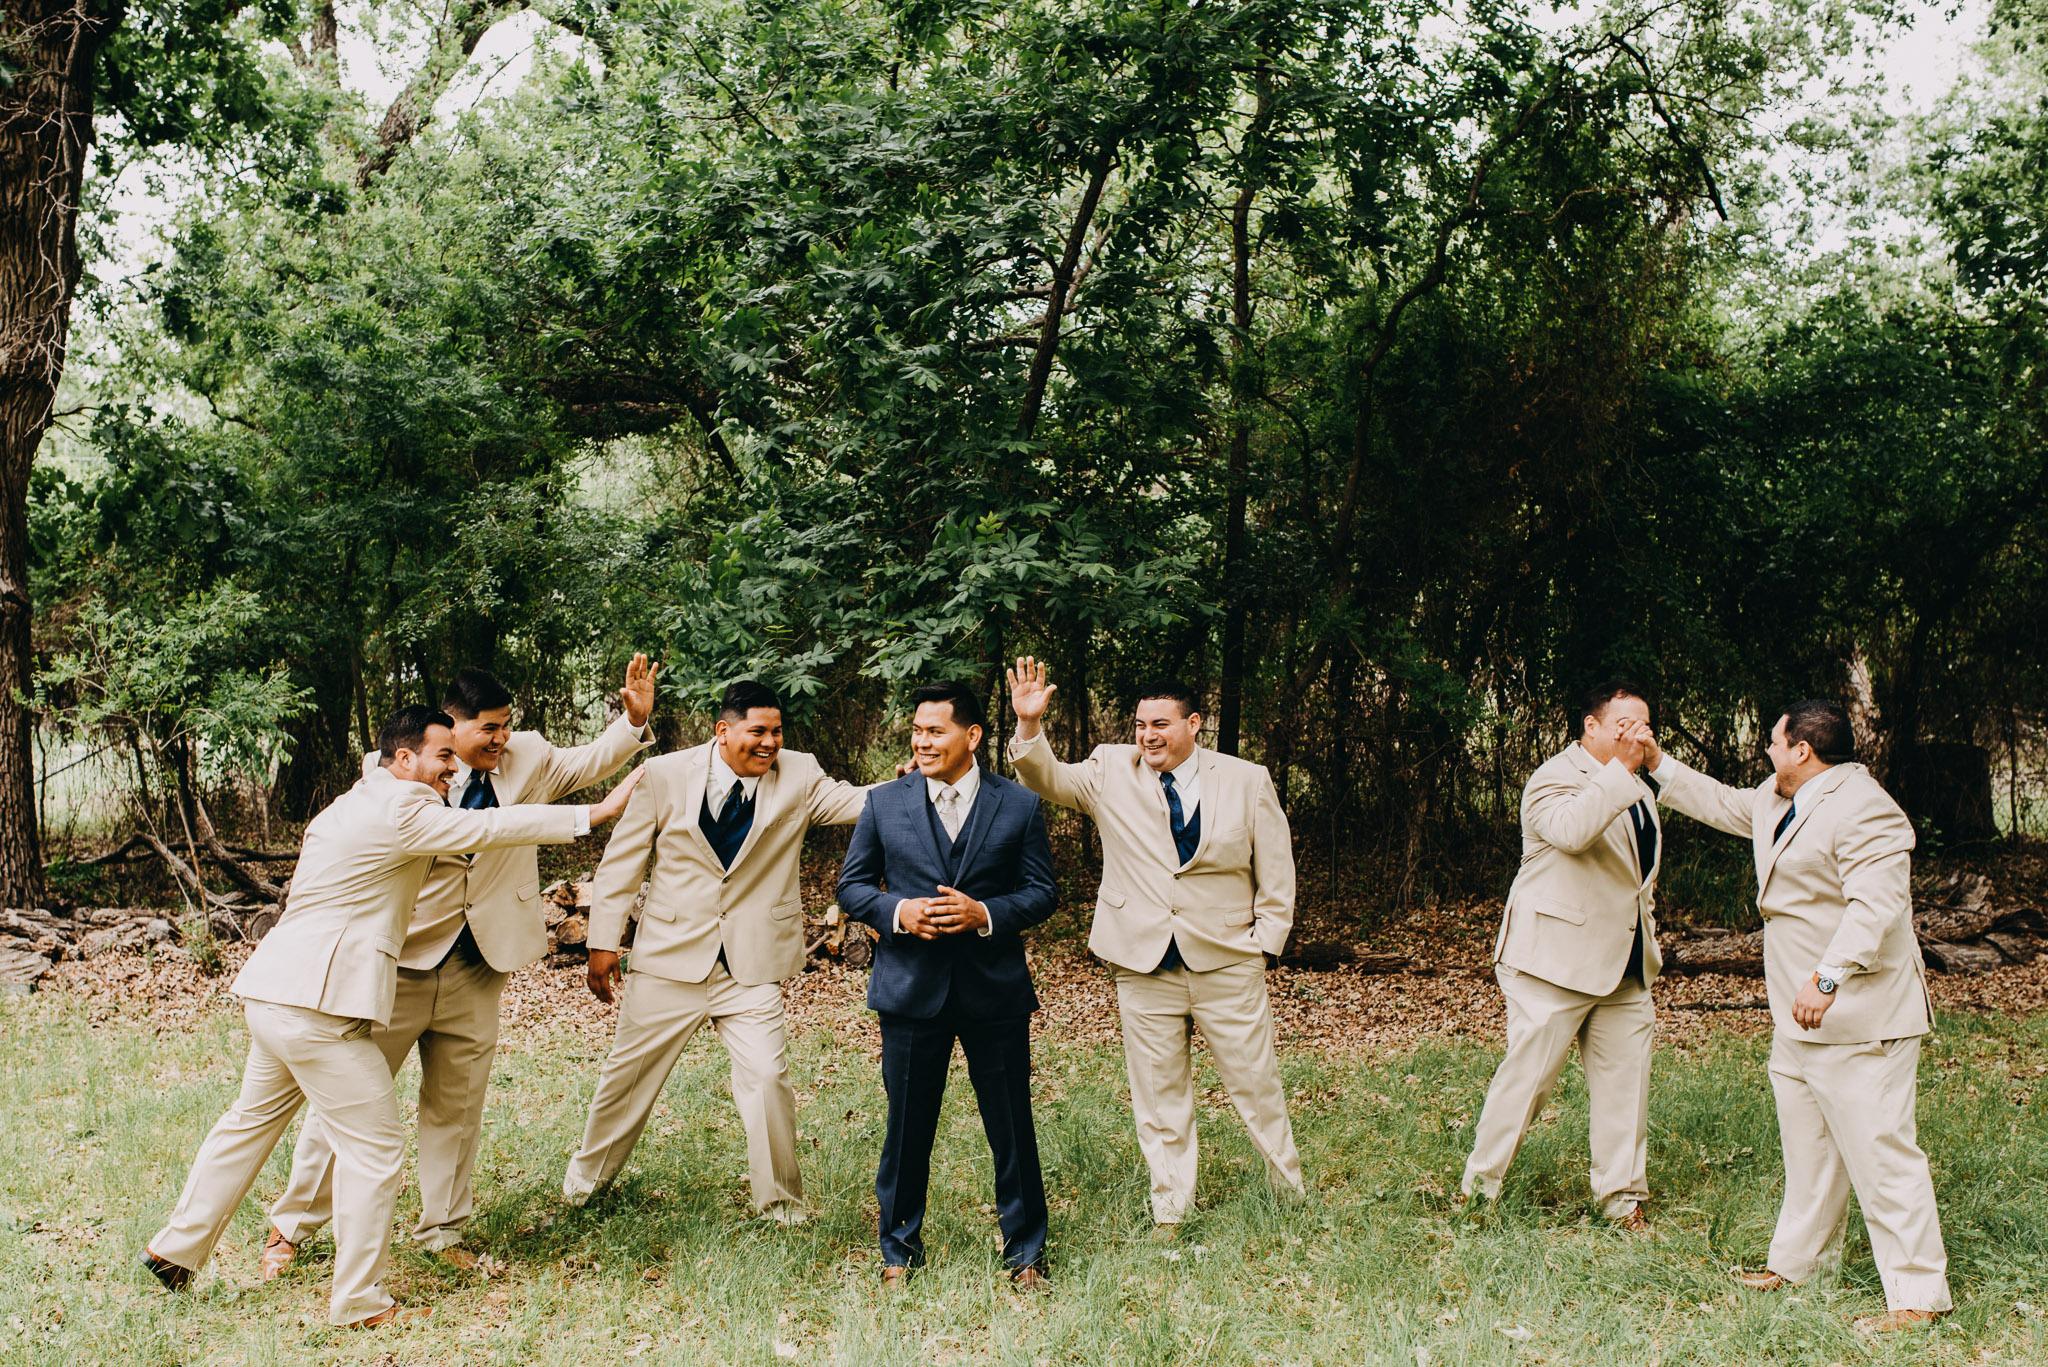 Christoval-Texas-Wedding_Photographer-Meghan&Tony-0004.jpg